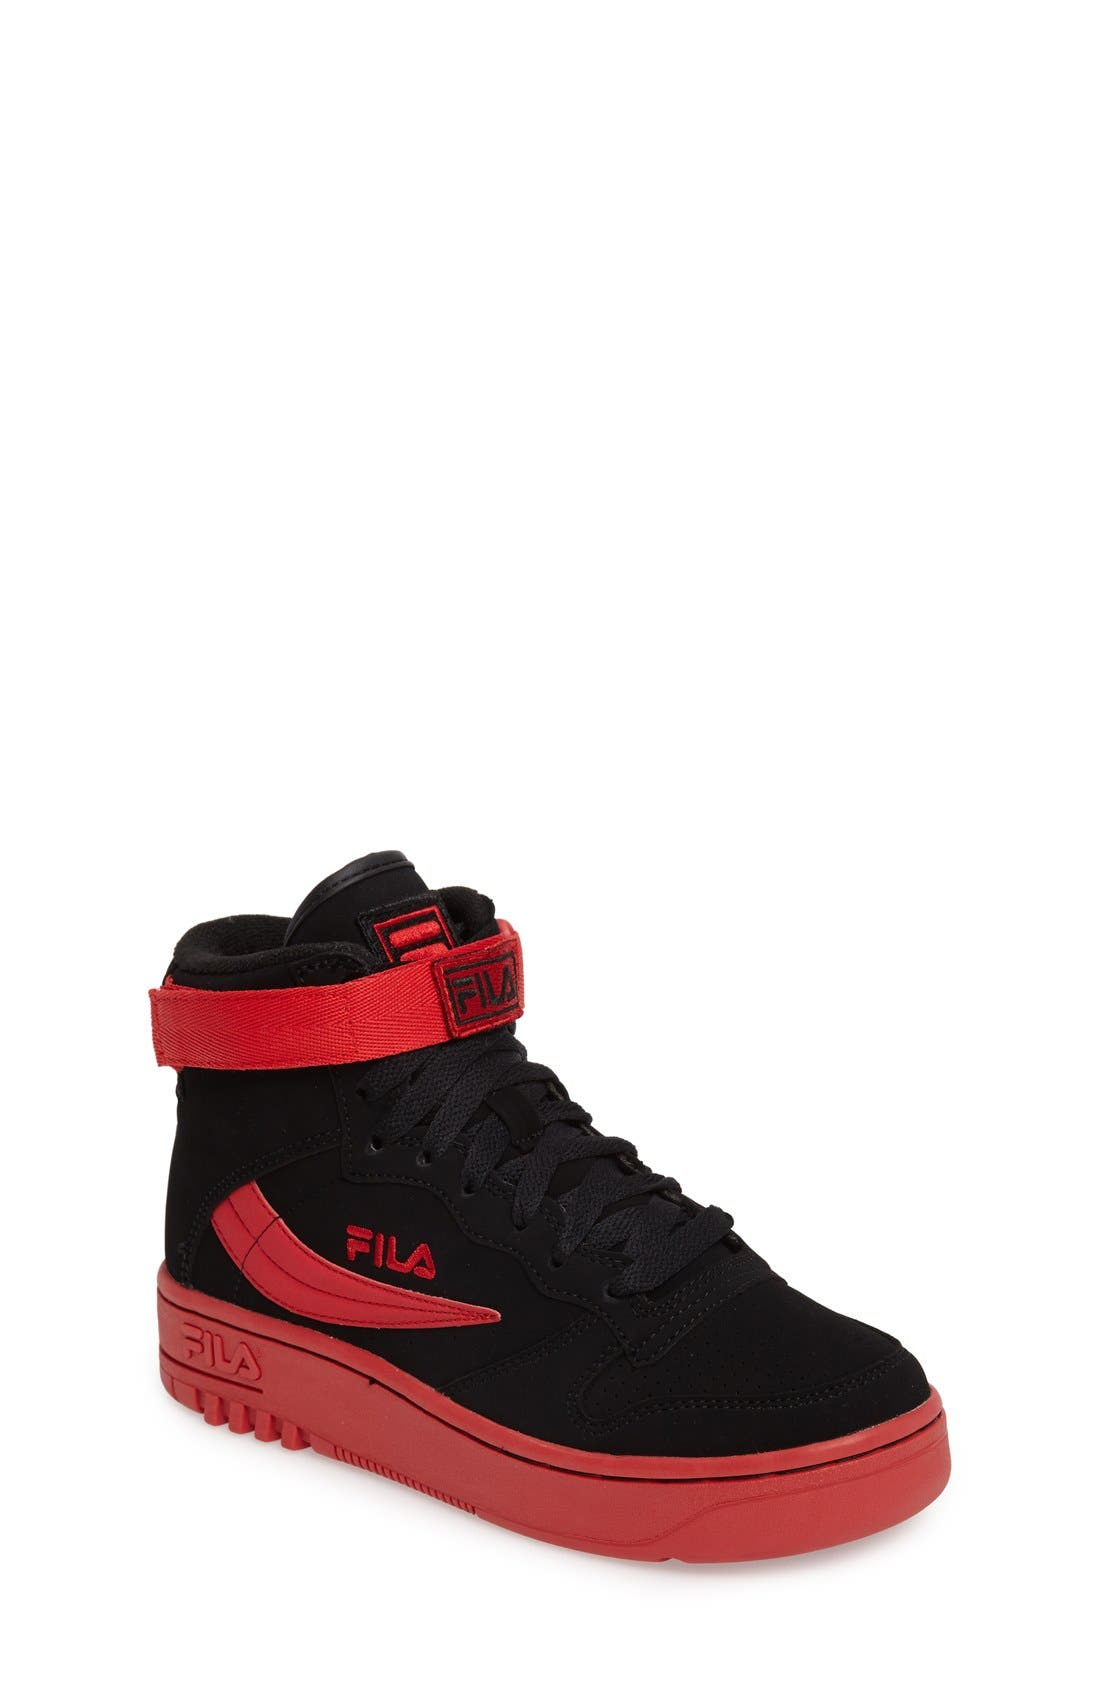 USA FX-100 High Top Sneaker,                             Main thumbnail 1, color,                             001